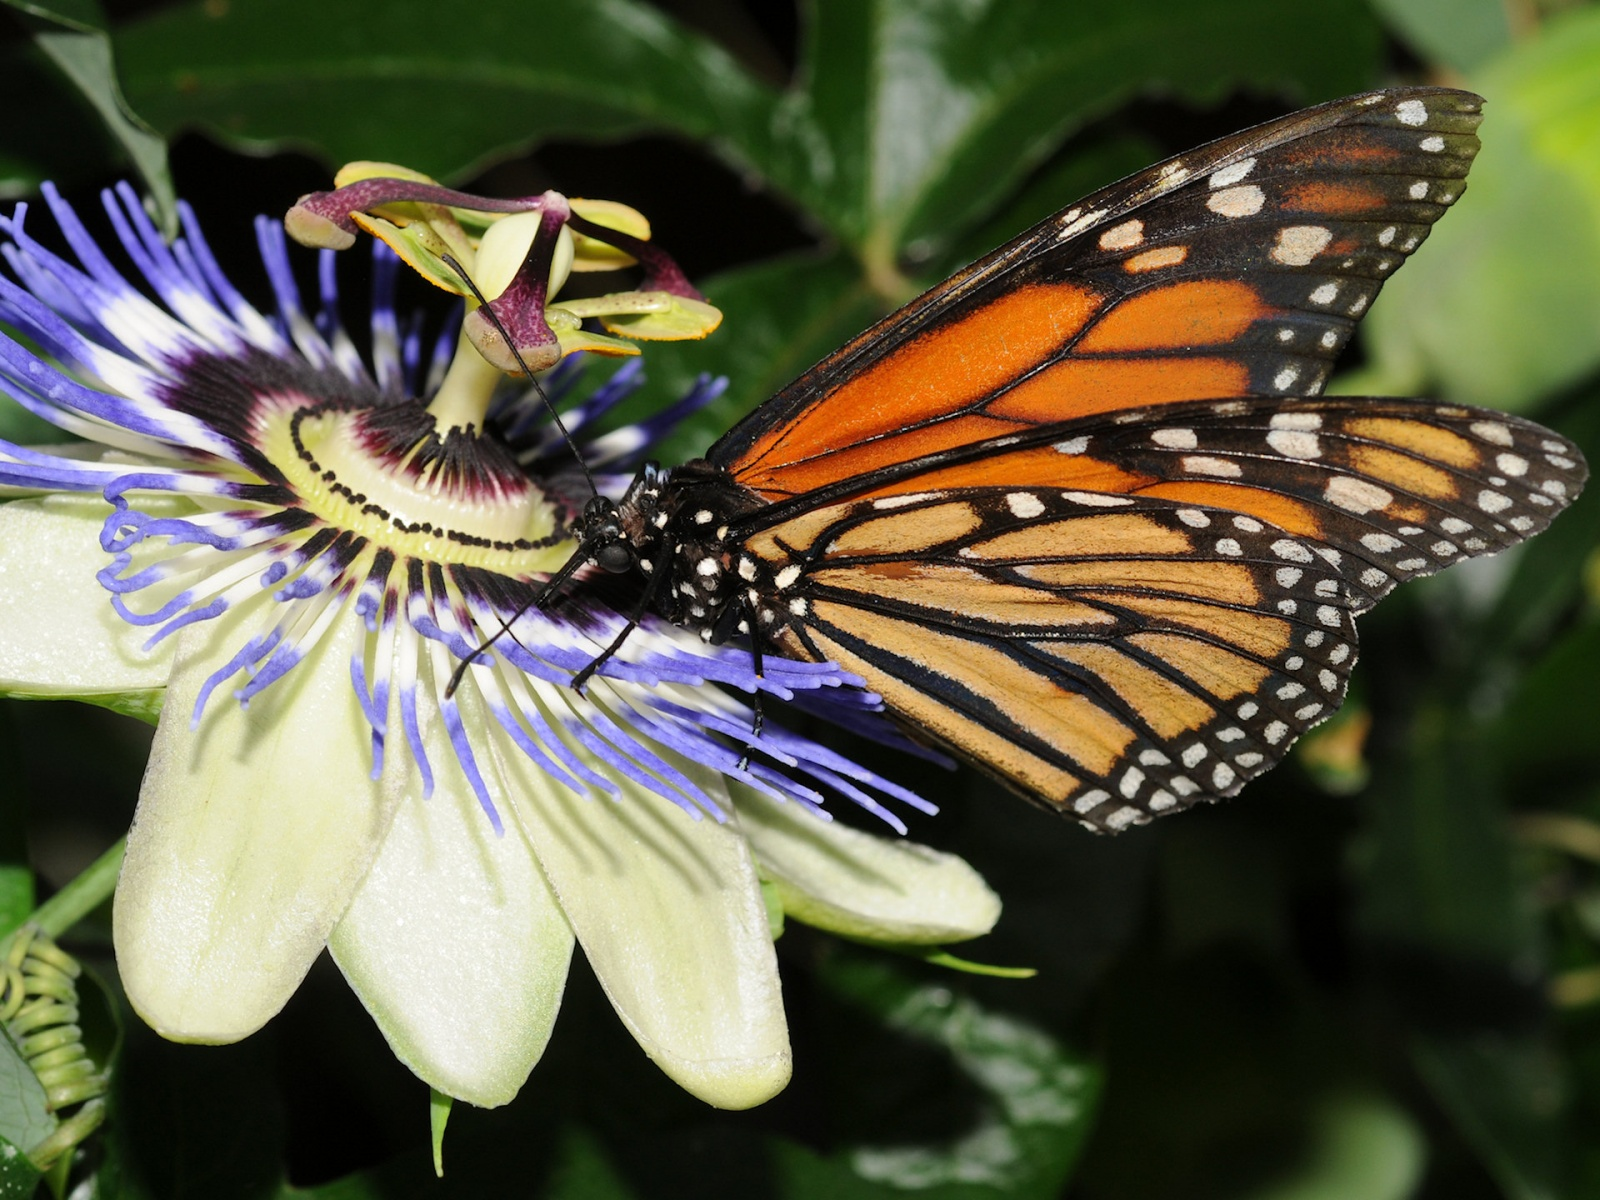 Butterfly Wallpapers ~ Top Best HD Wallpapers for Desktop